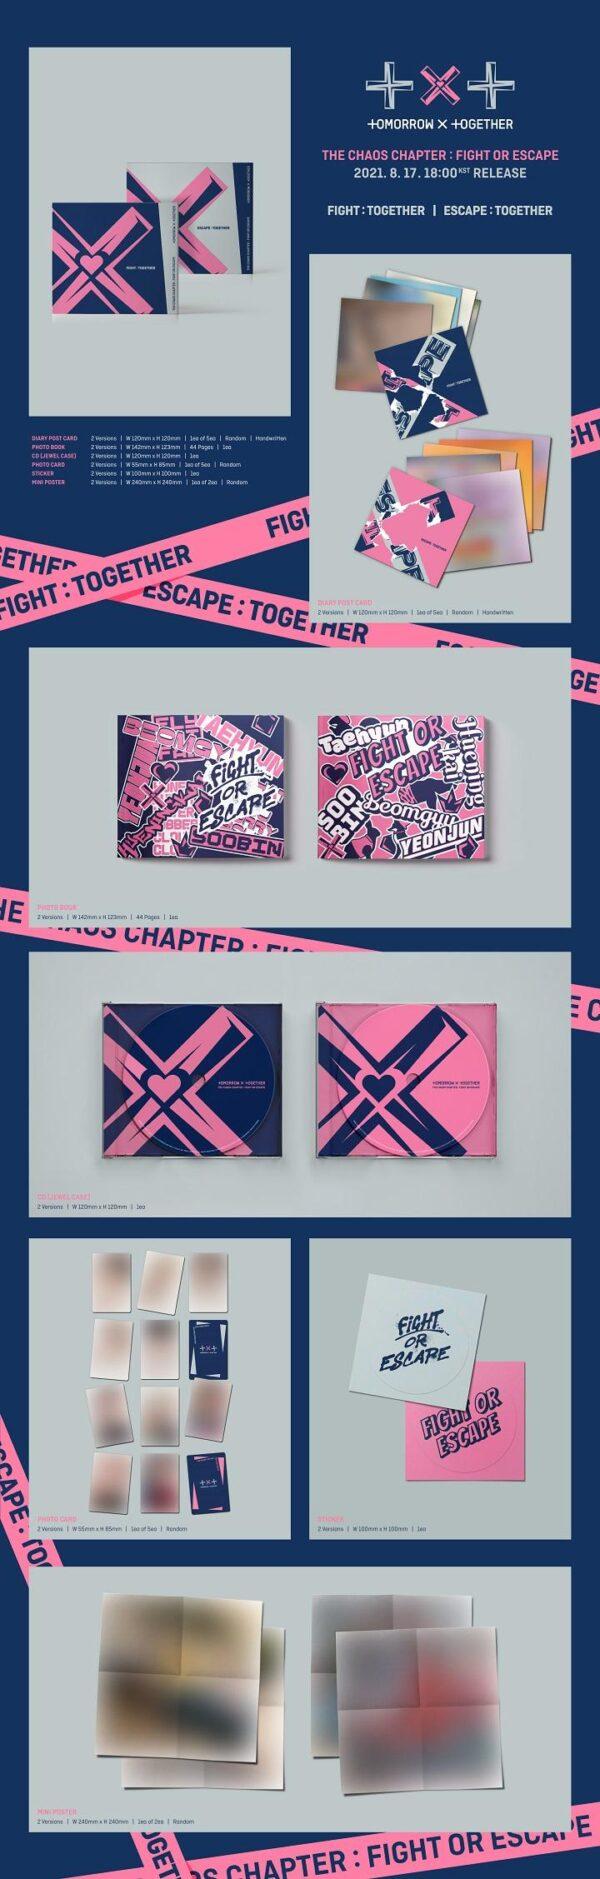 Album de TXT Chaos Chapter FIGHT OR ESCAPE Random Ver. 1